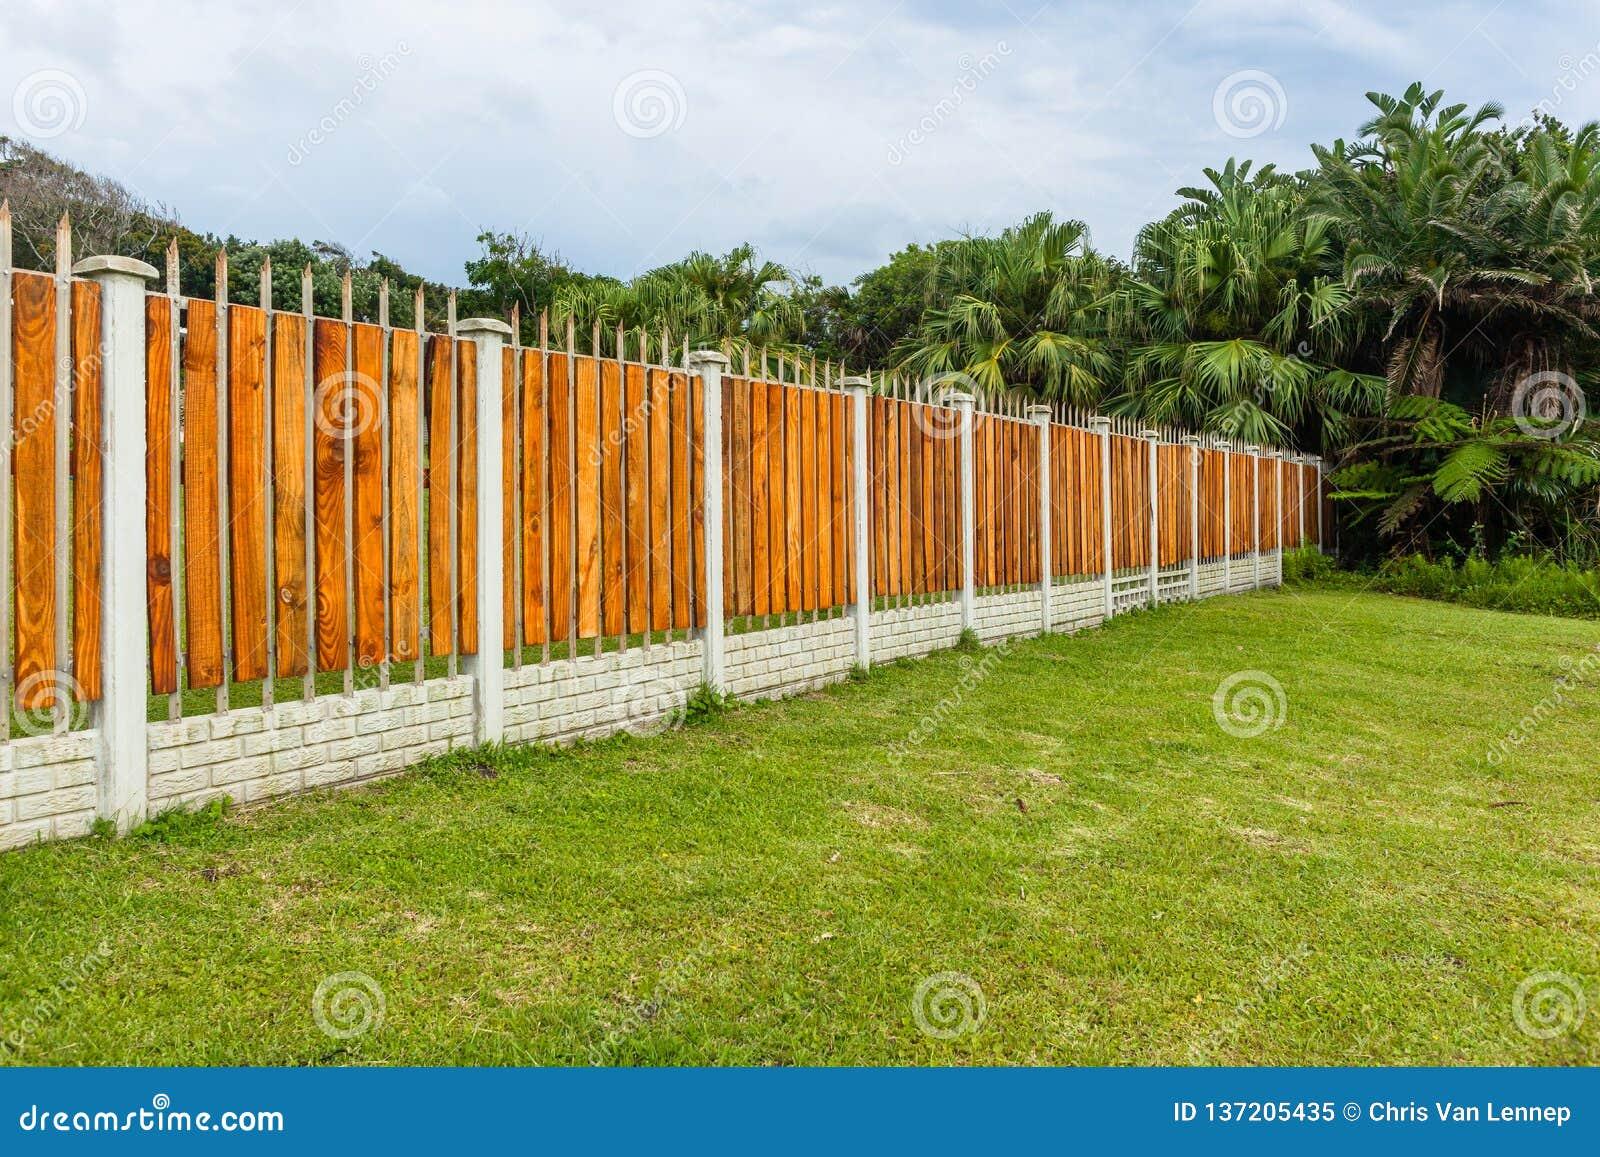 Boundary Fence Wood Steel Trees Stock Image - Image of slats